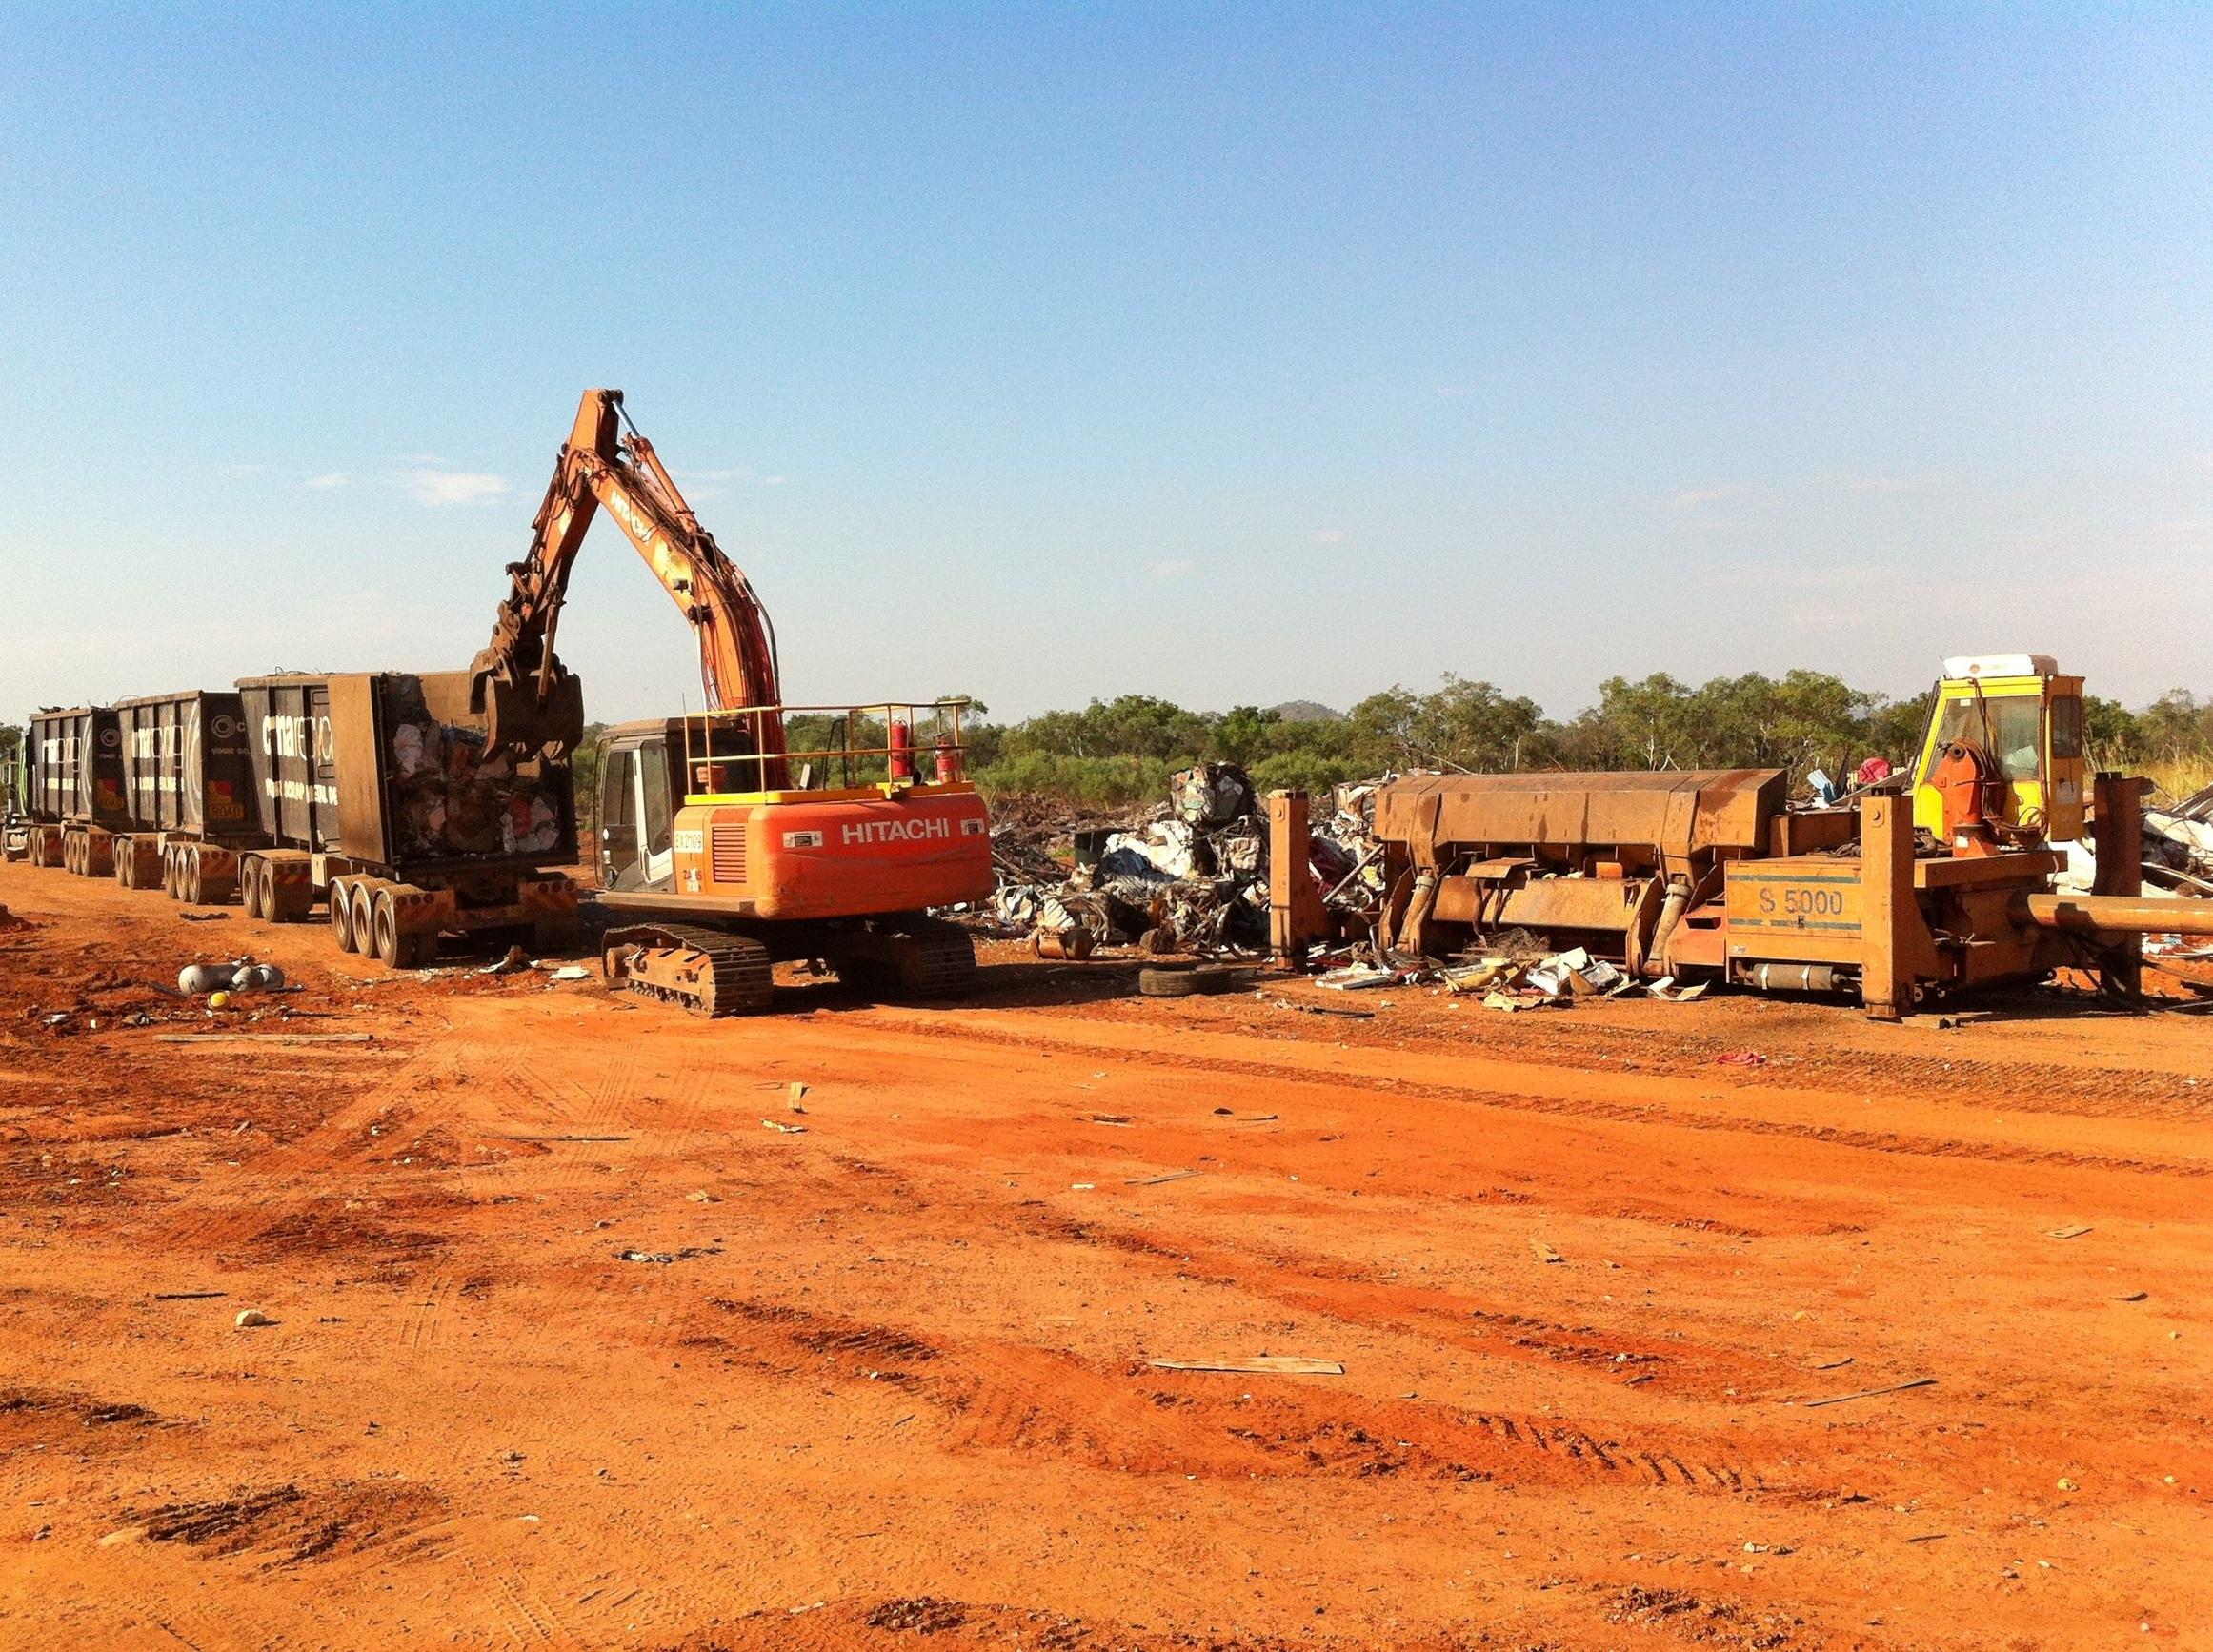 Scrap metal crusher and truck Apr13.jpg